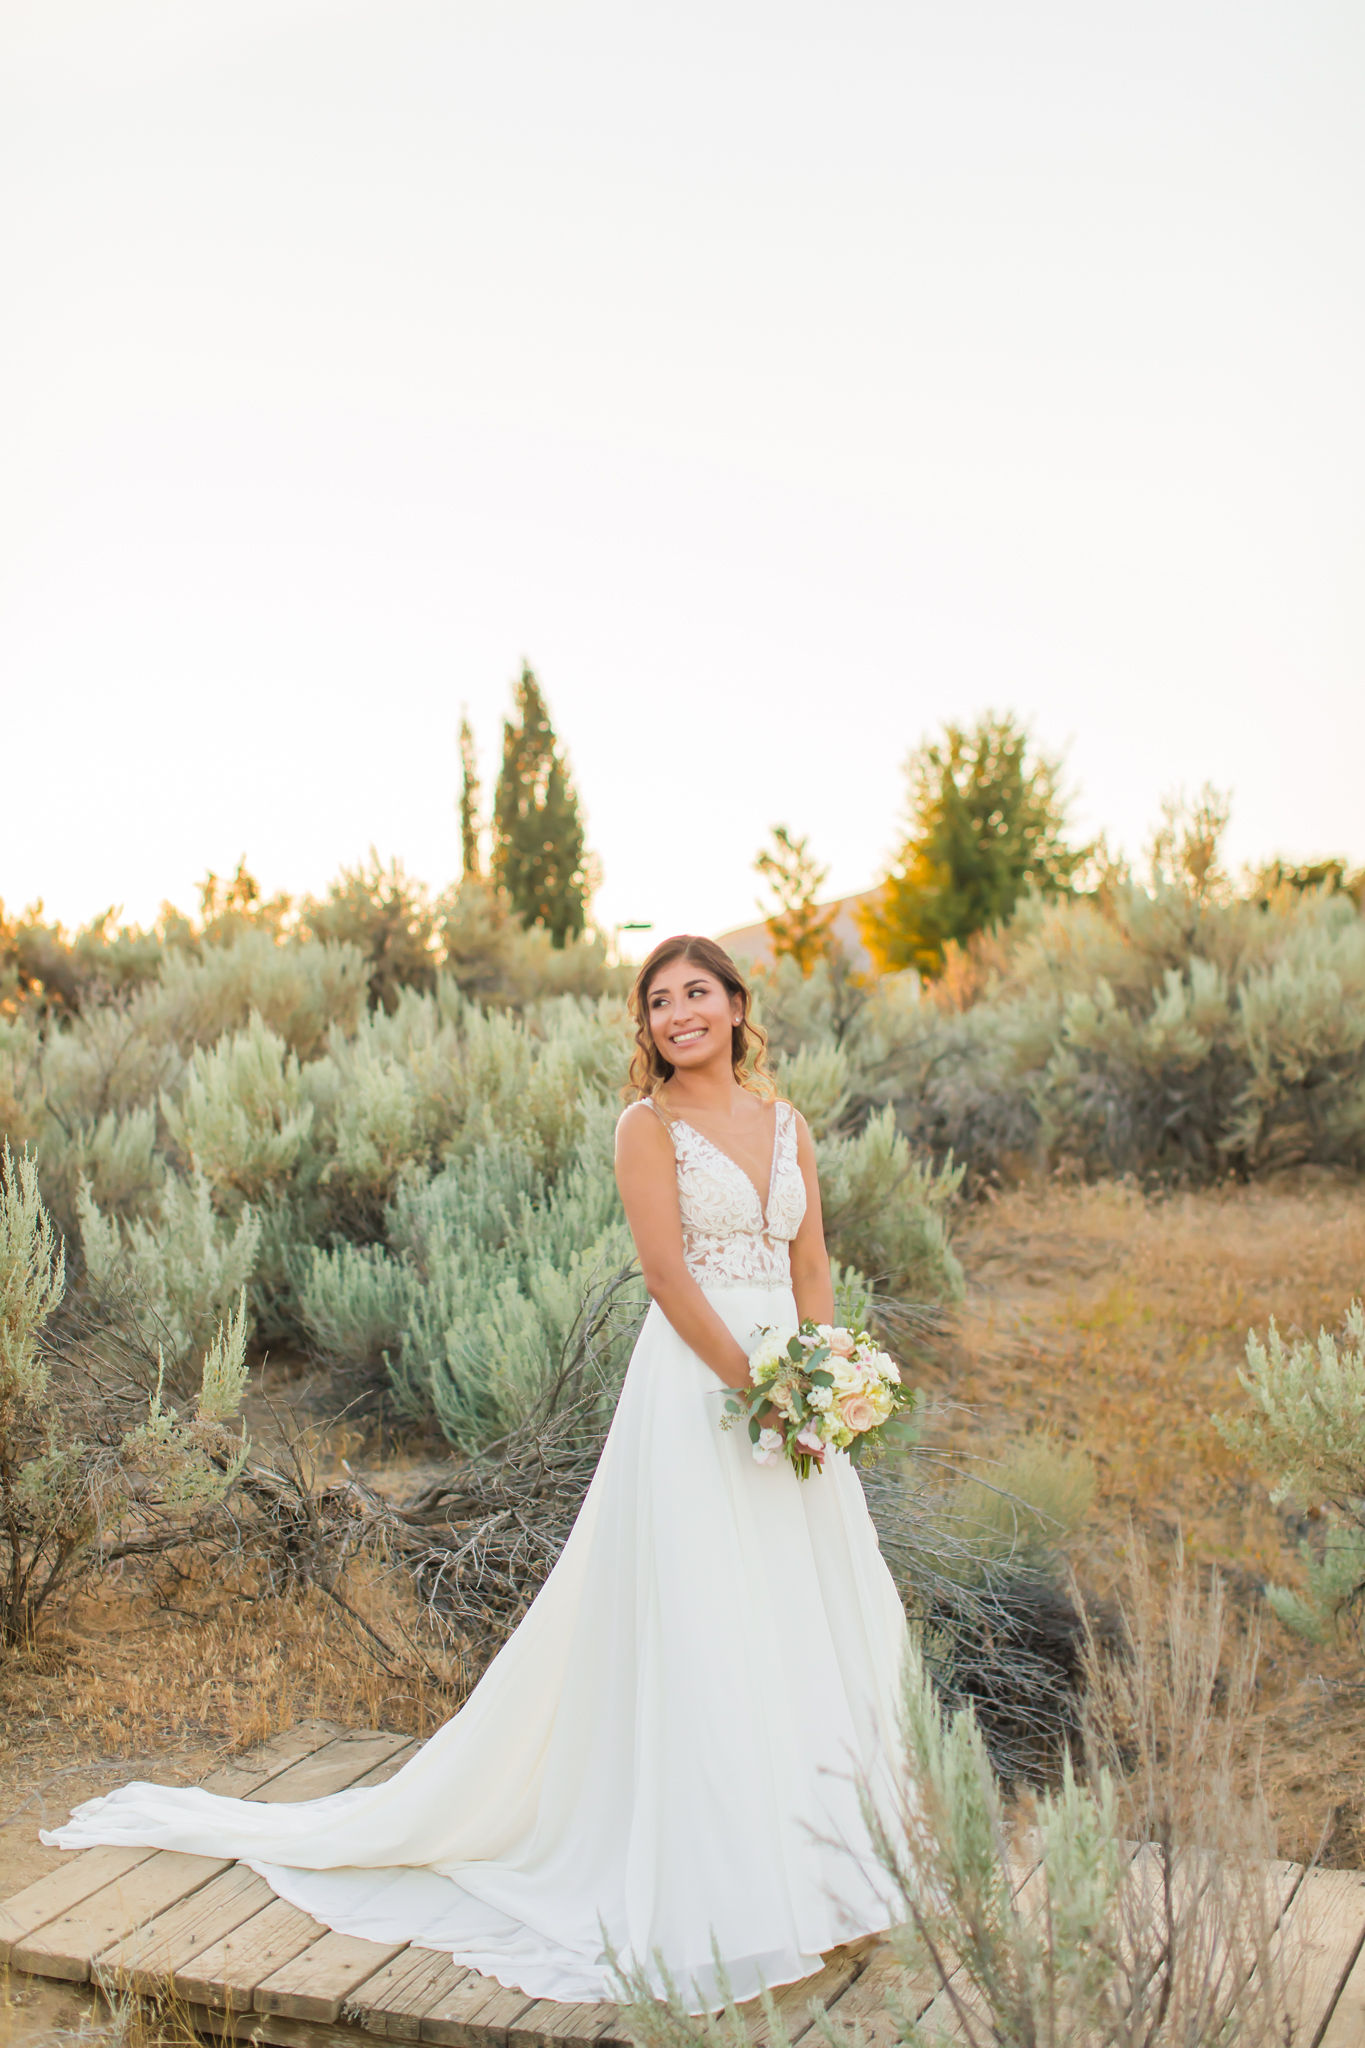 Solo shot of bride in wedding dress